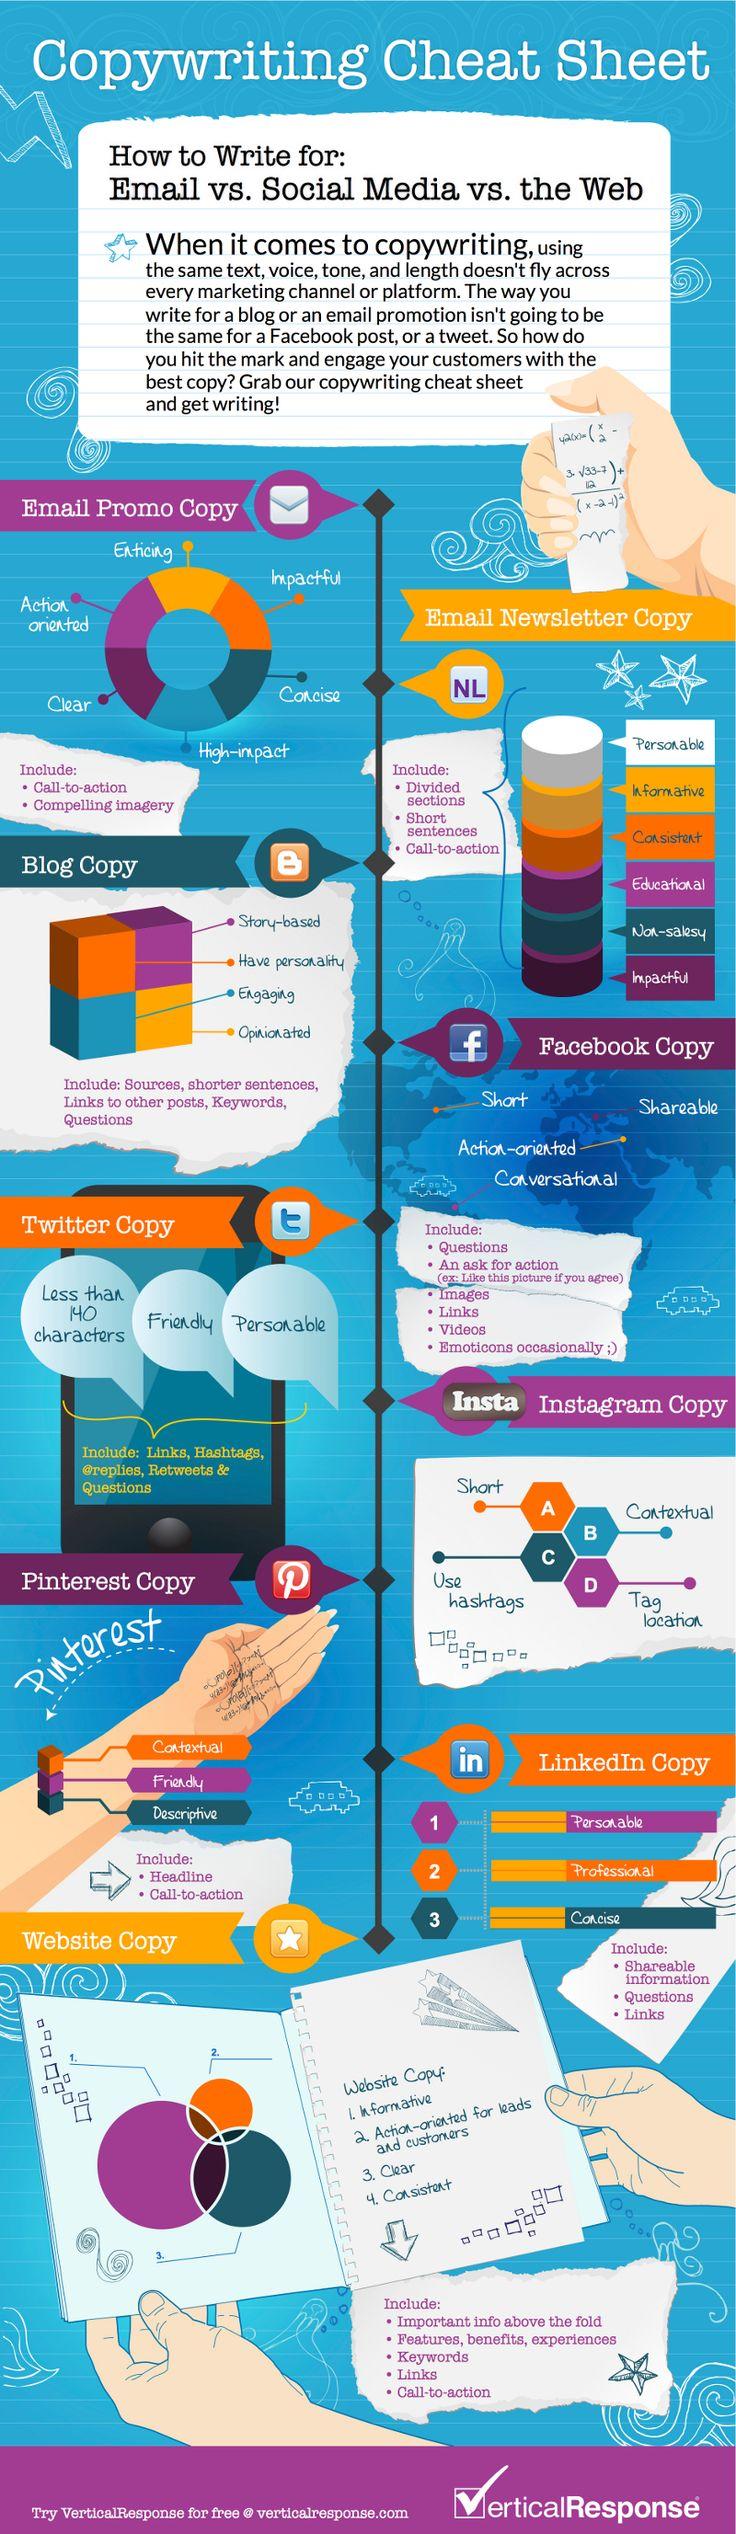 Guide to Web Copywriting 8 Great Web Copywriting Tips